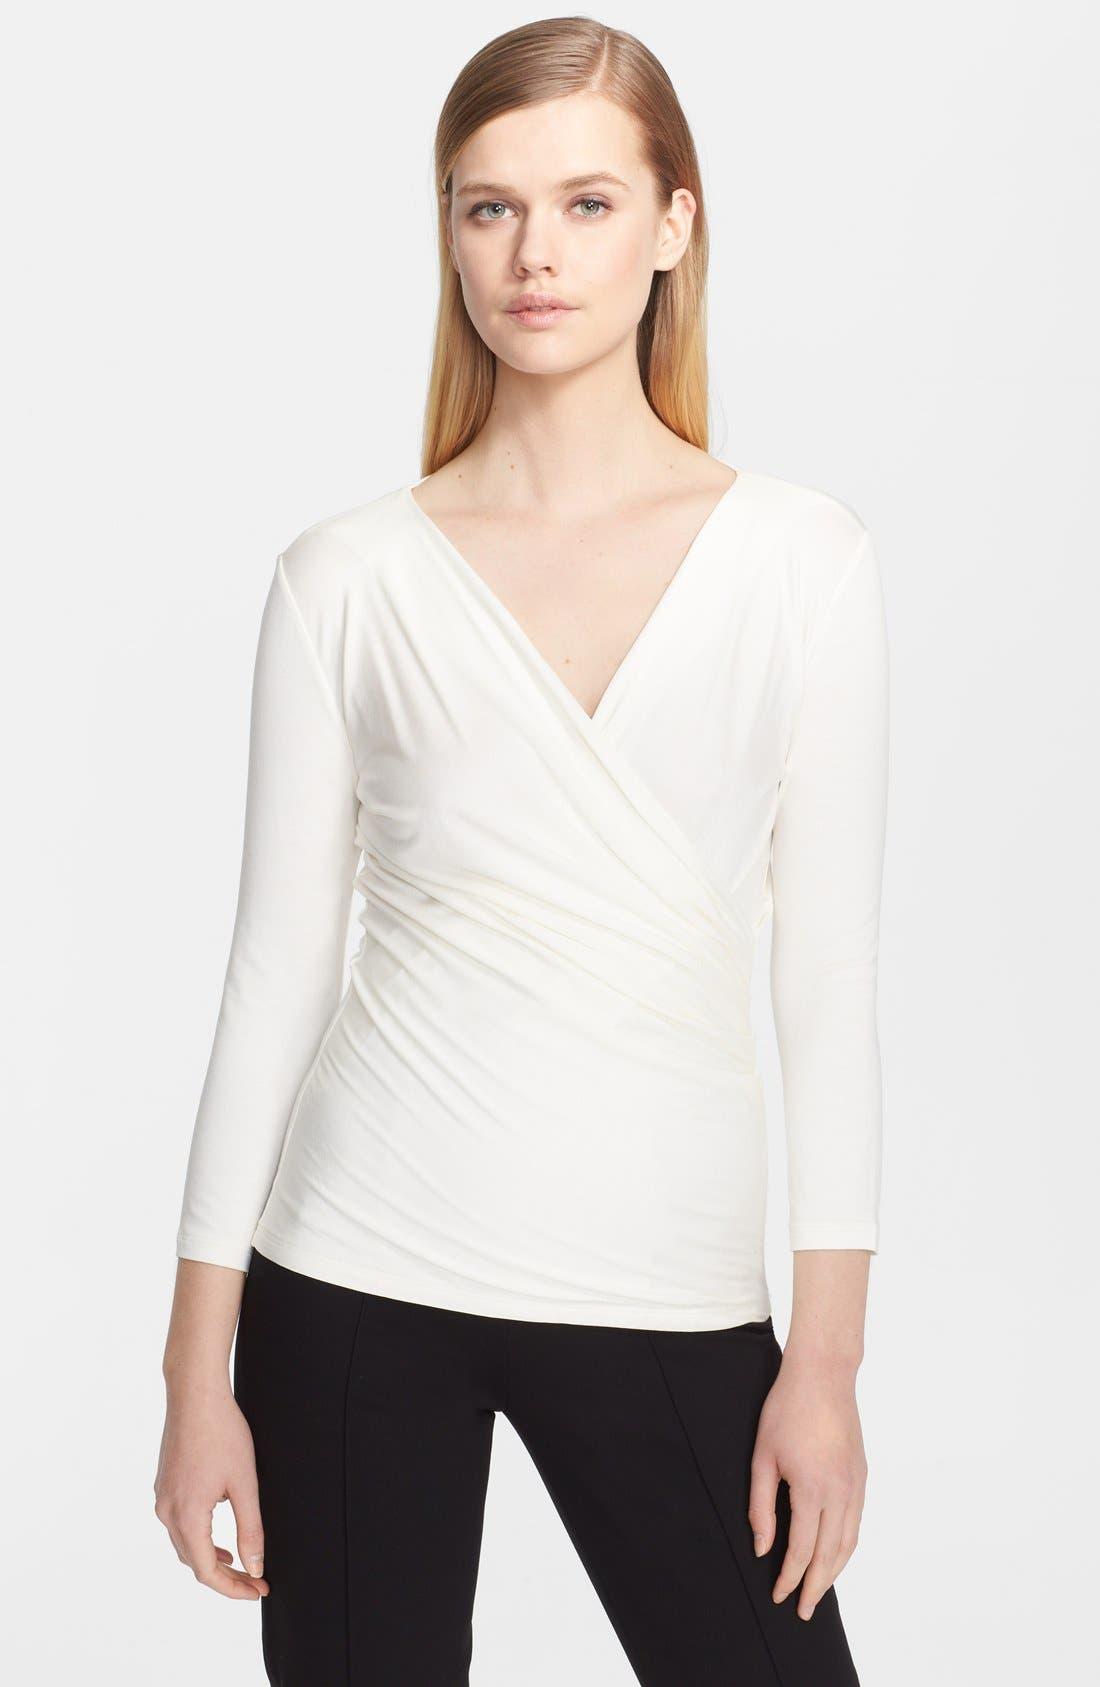 Alternate Image 1 Selected - Max Mara 'Caprice' Surplice Jersey Top